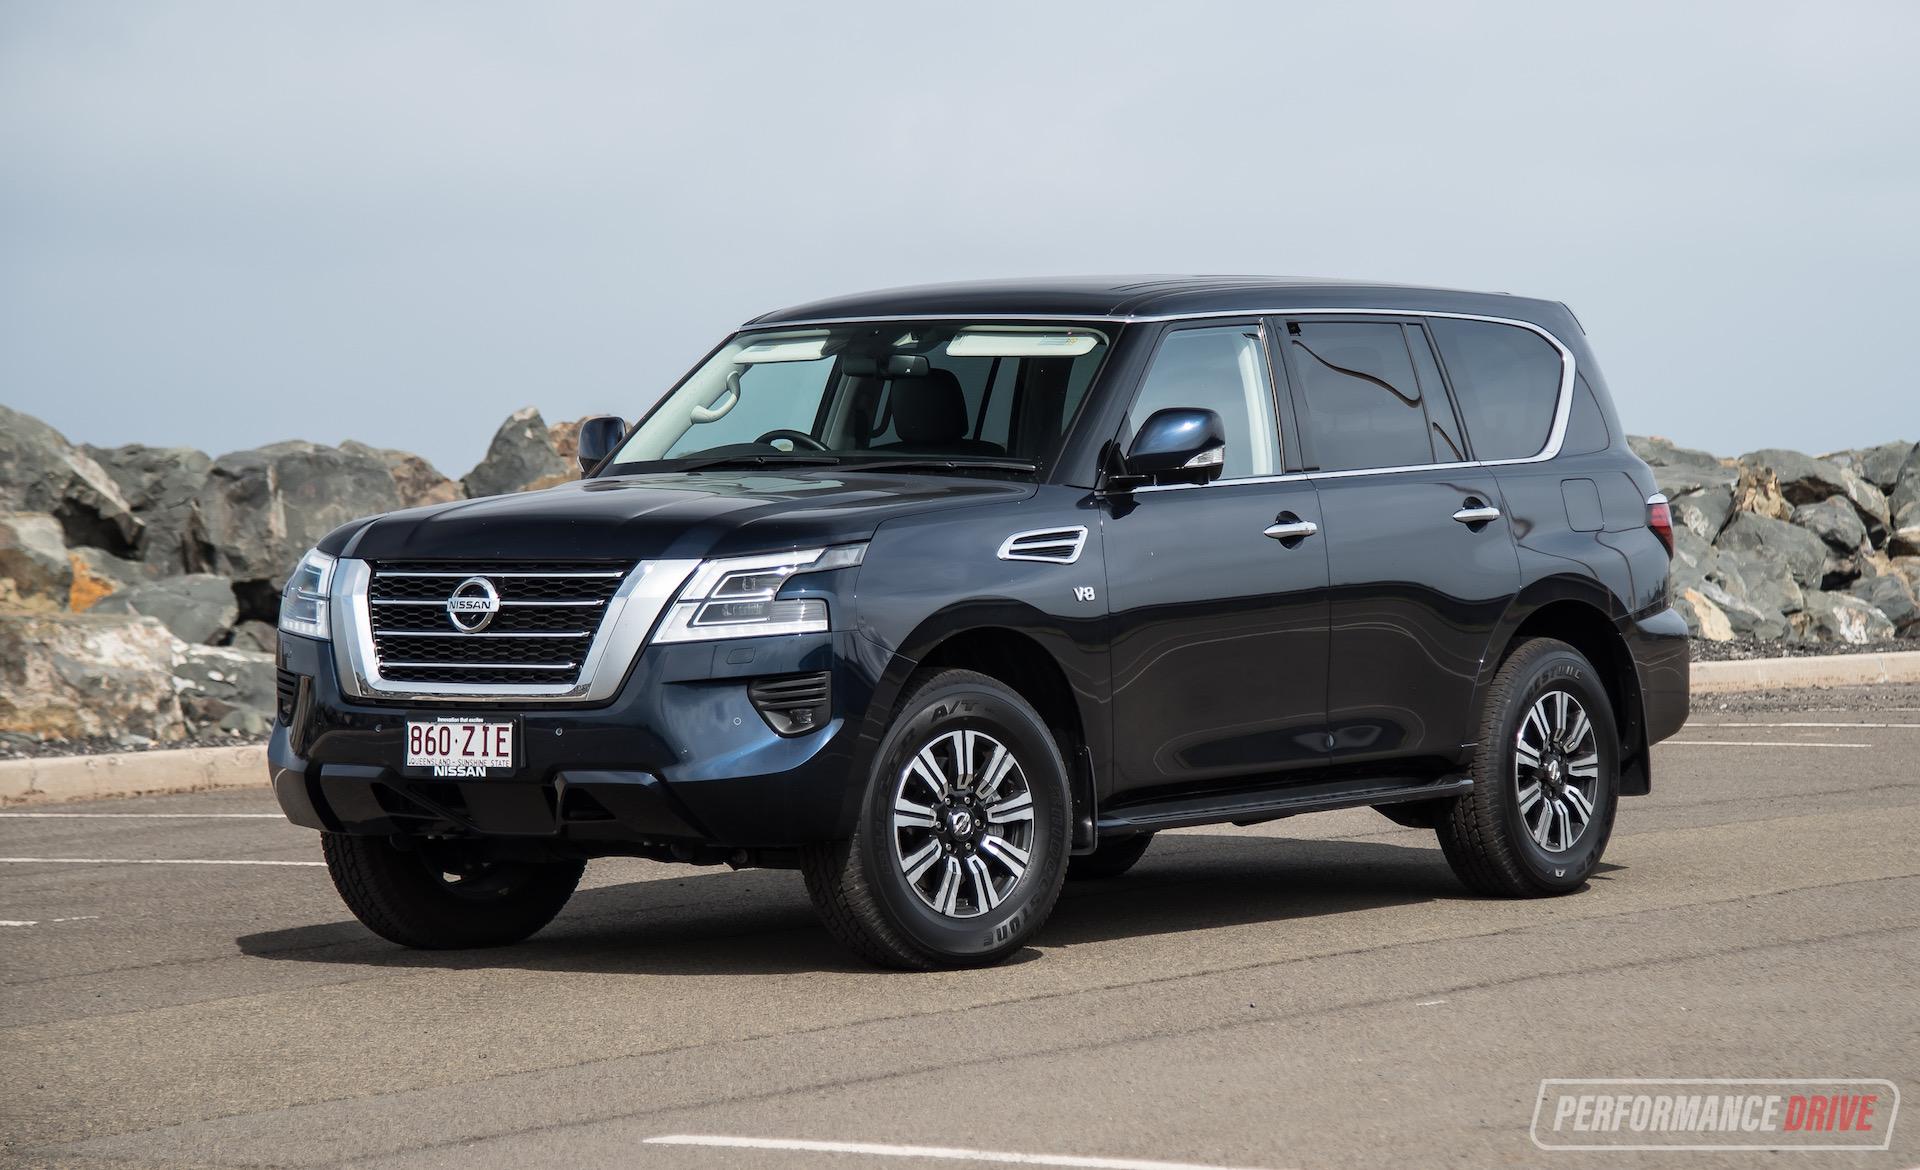 2020 Nissan Patrol Ti Review Video Performancedrive